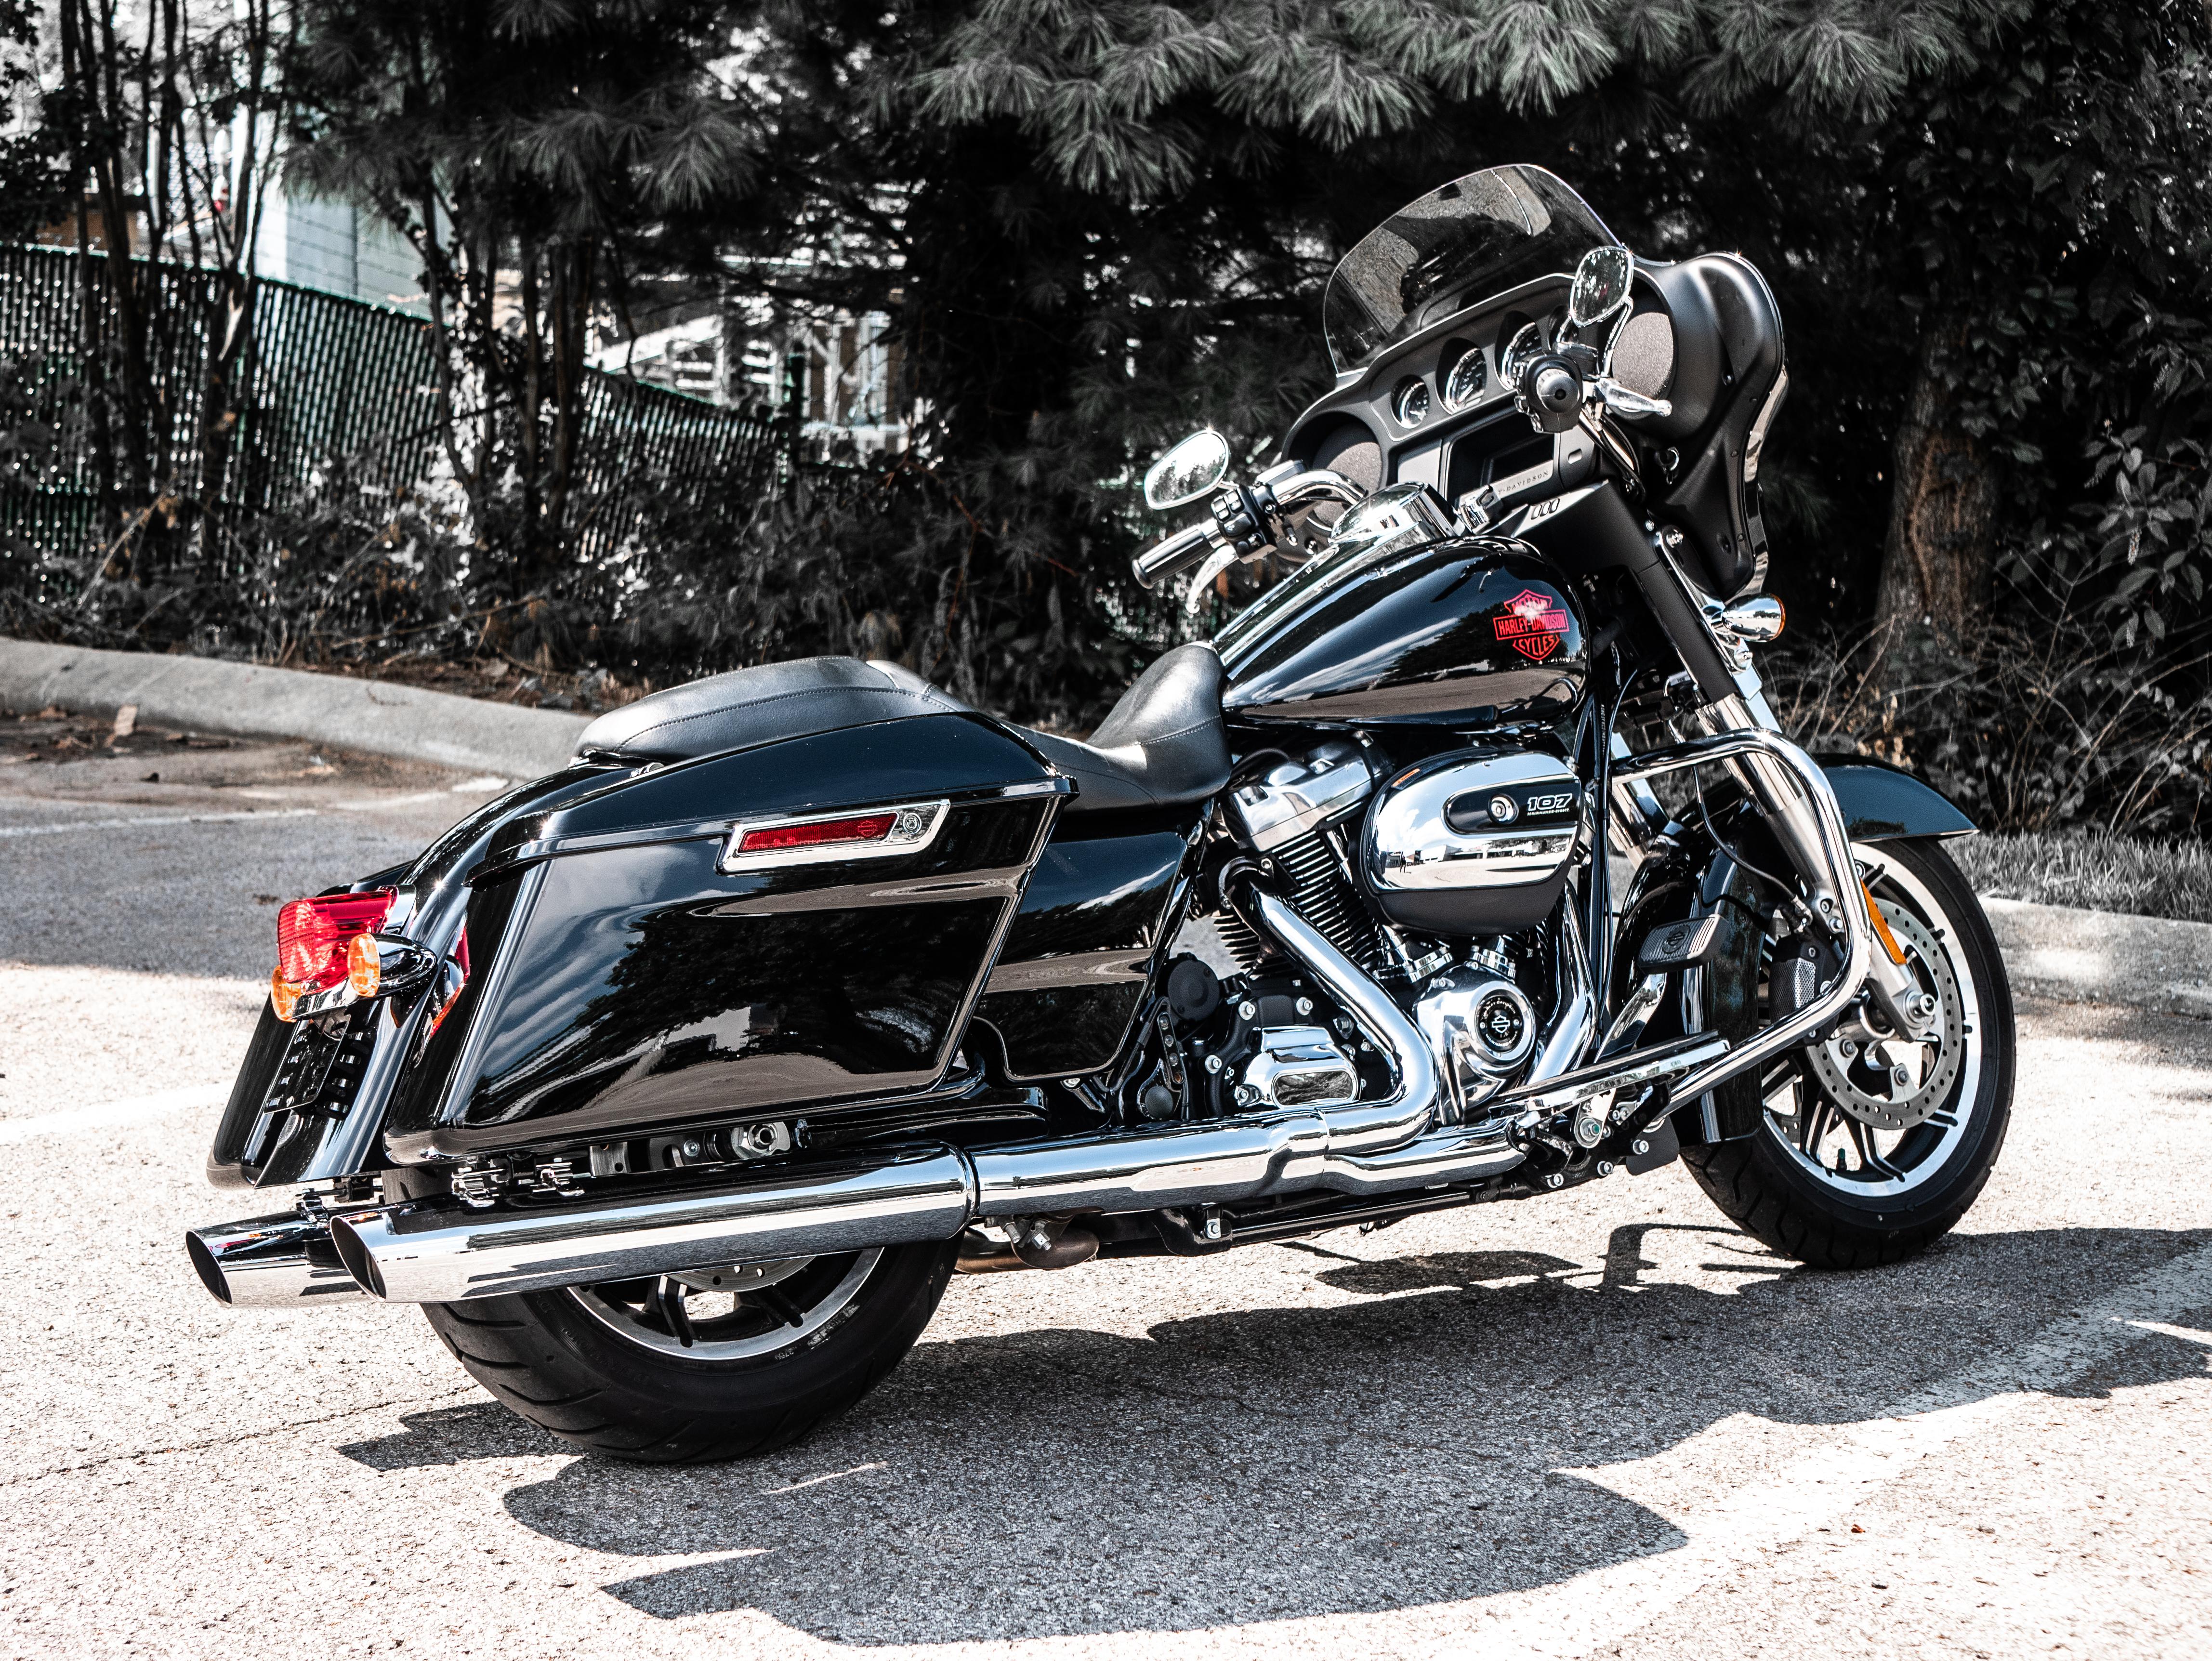 New 2020 Harley-Davidson Electra Glide Standard